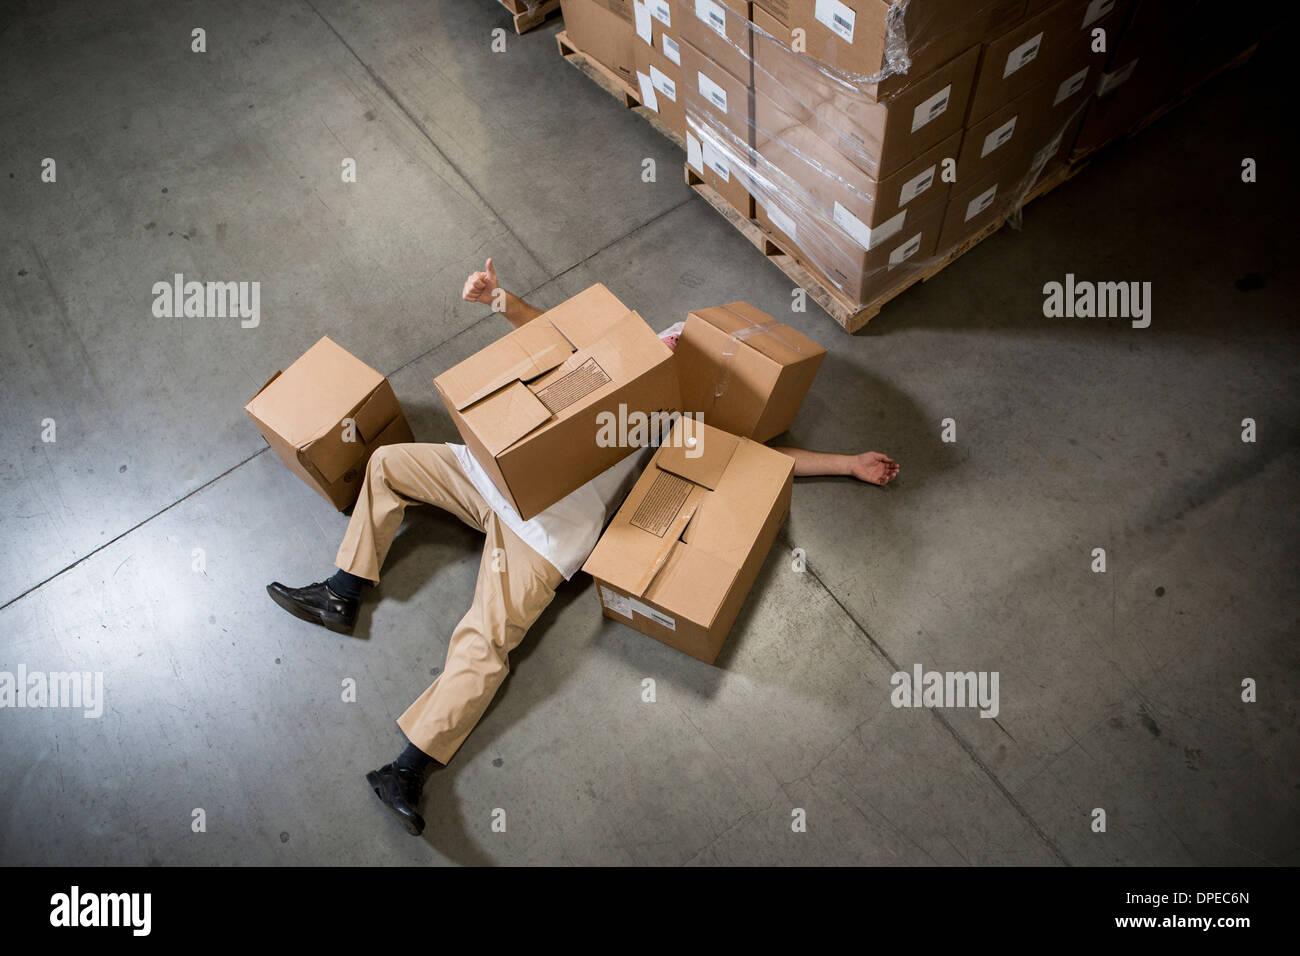 Work Warehouse Late Worker